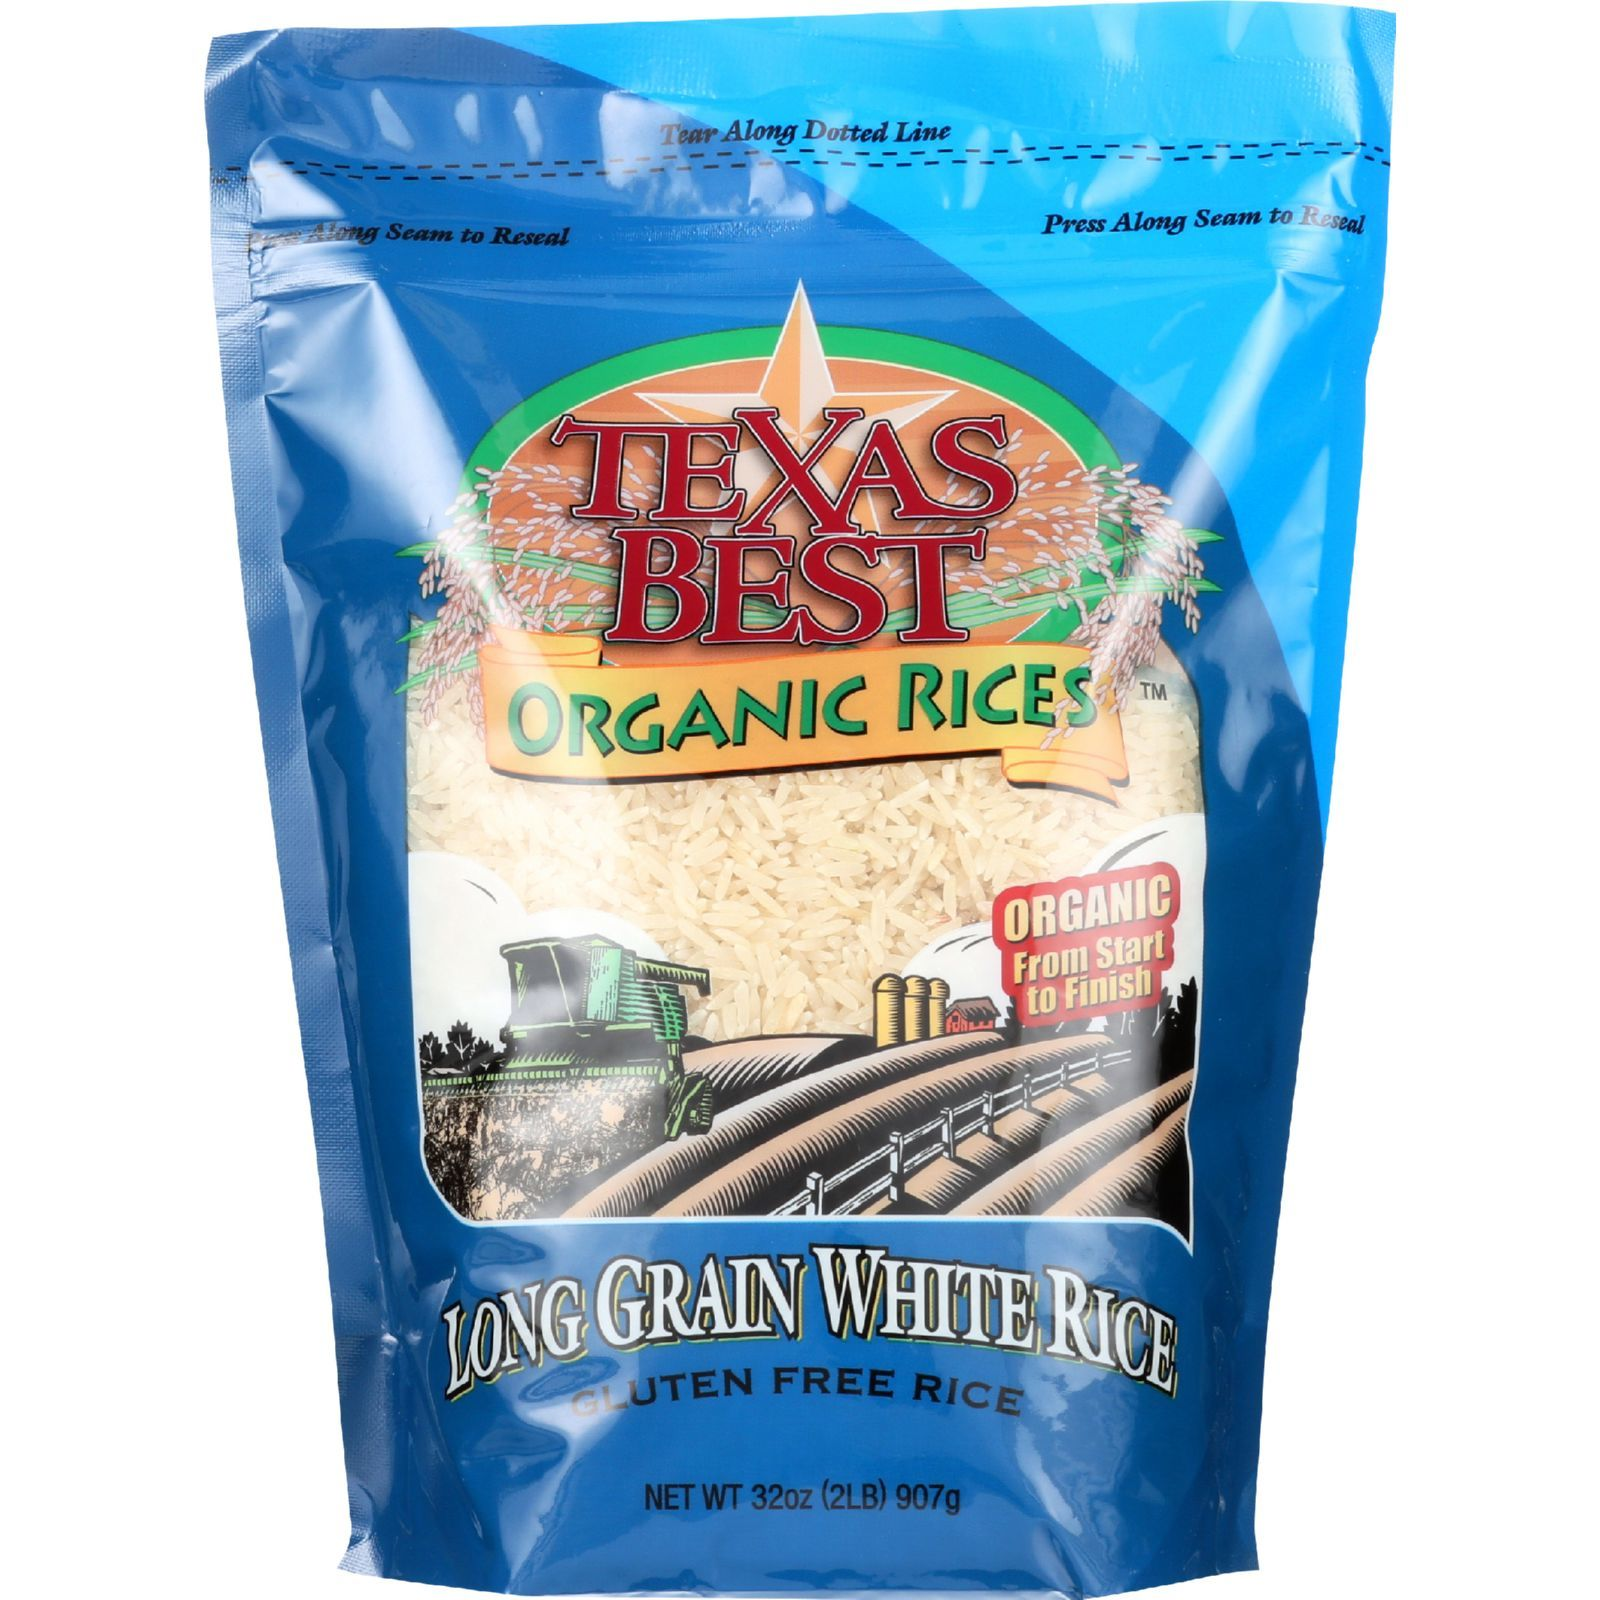 Texas Best Organics Rice - Organic - Long Grain White - 32 oz - case of 6